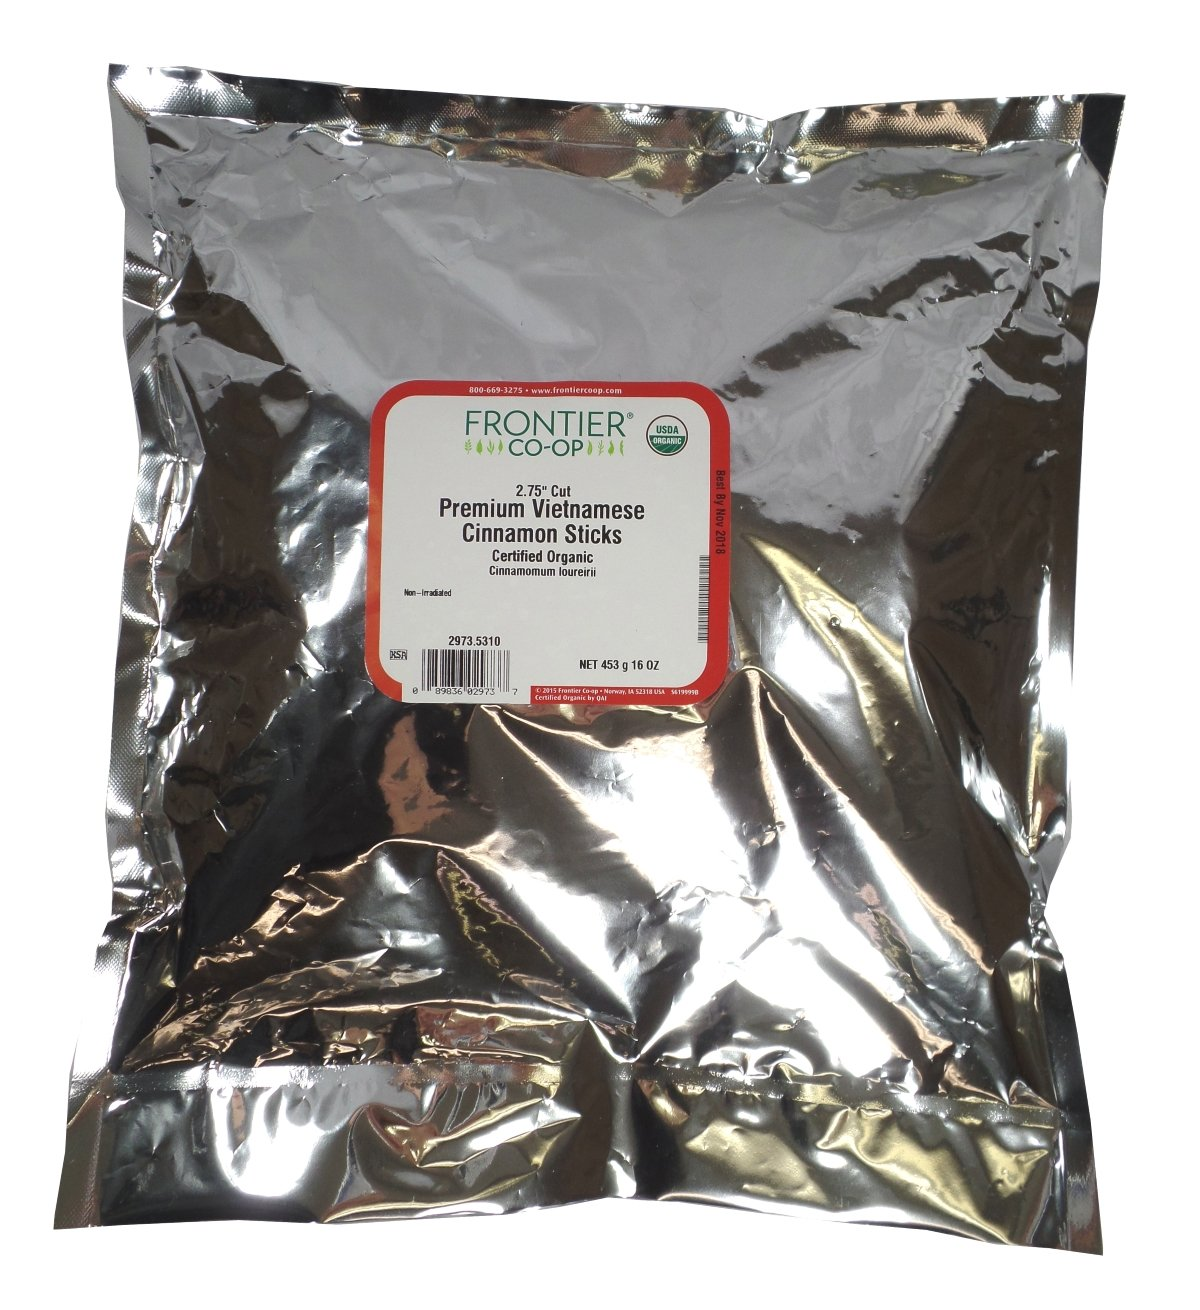 Frontier Cinnamon Sticks, Vietnamese Premium, 2 3/4'' Certified Organic - 16 oz